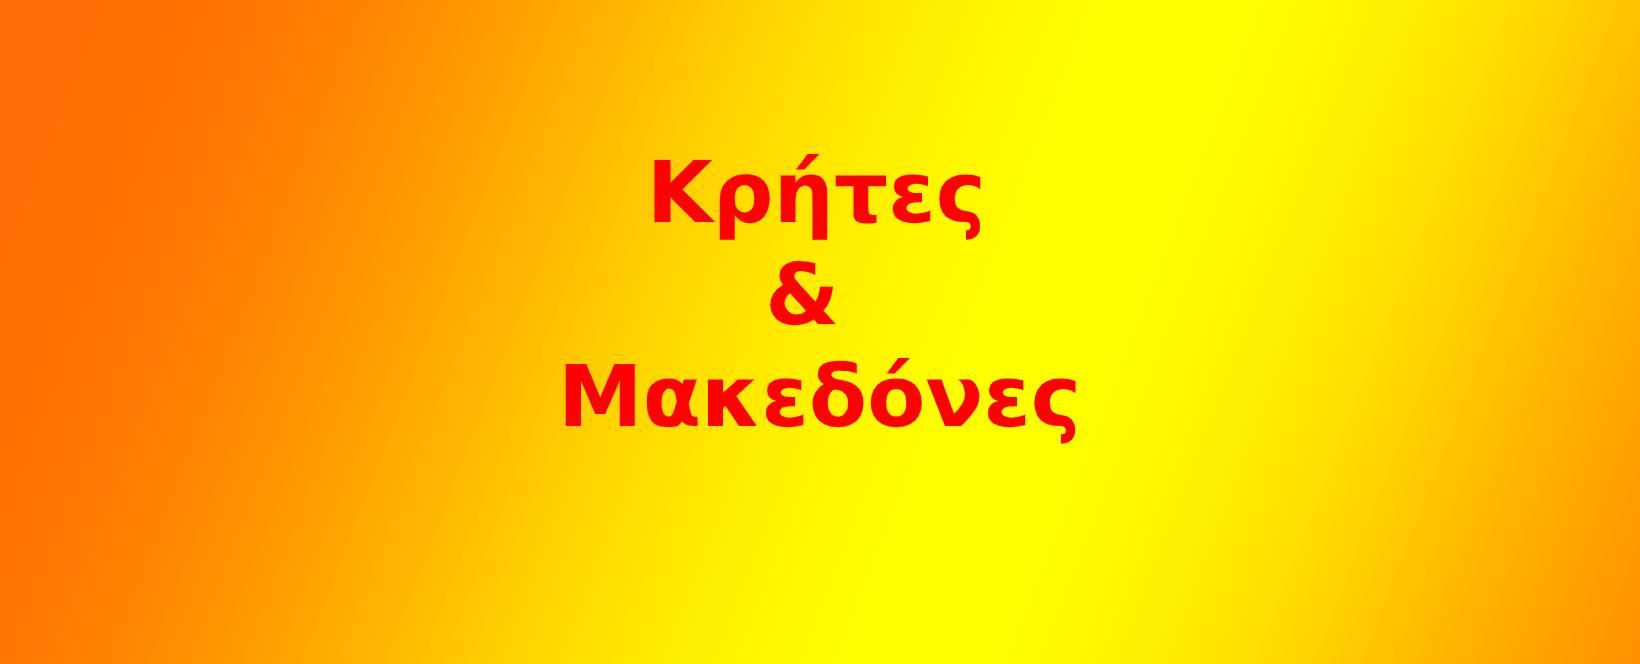 Krites & Makedones